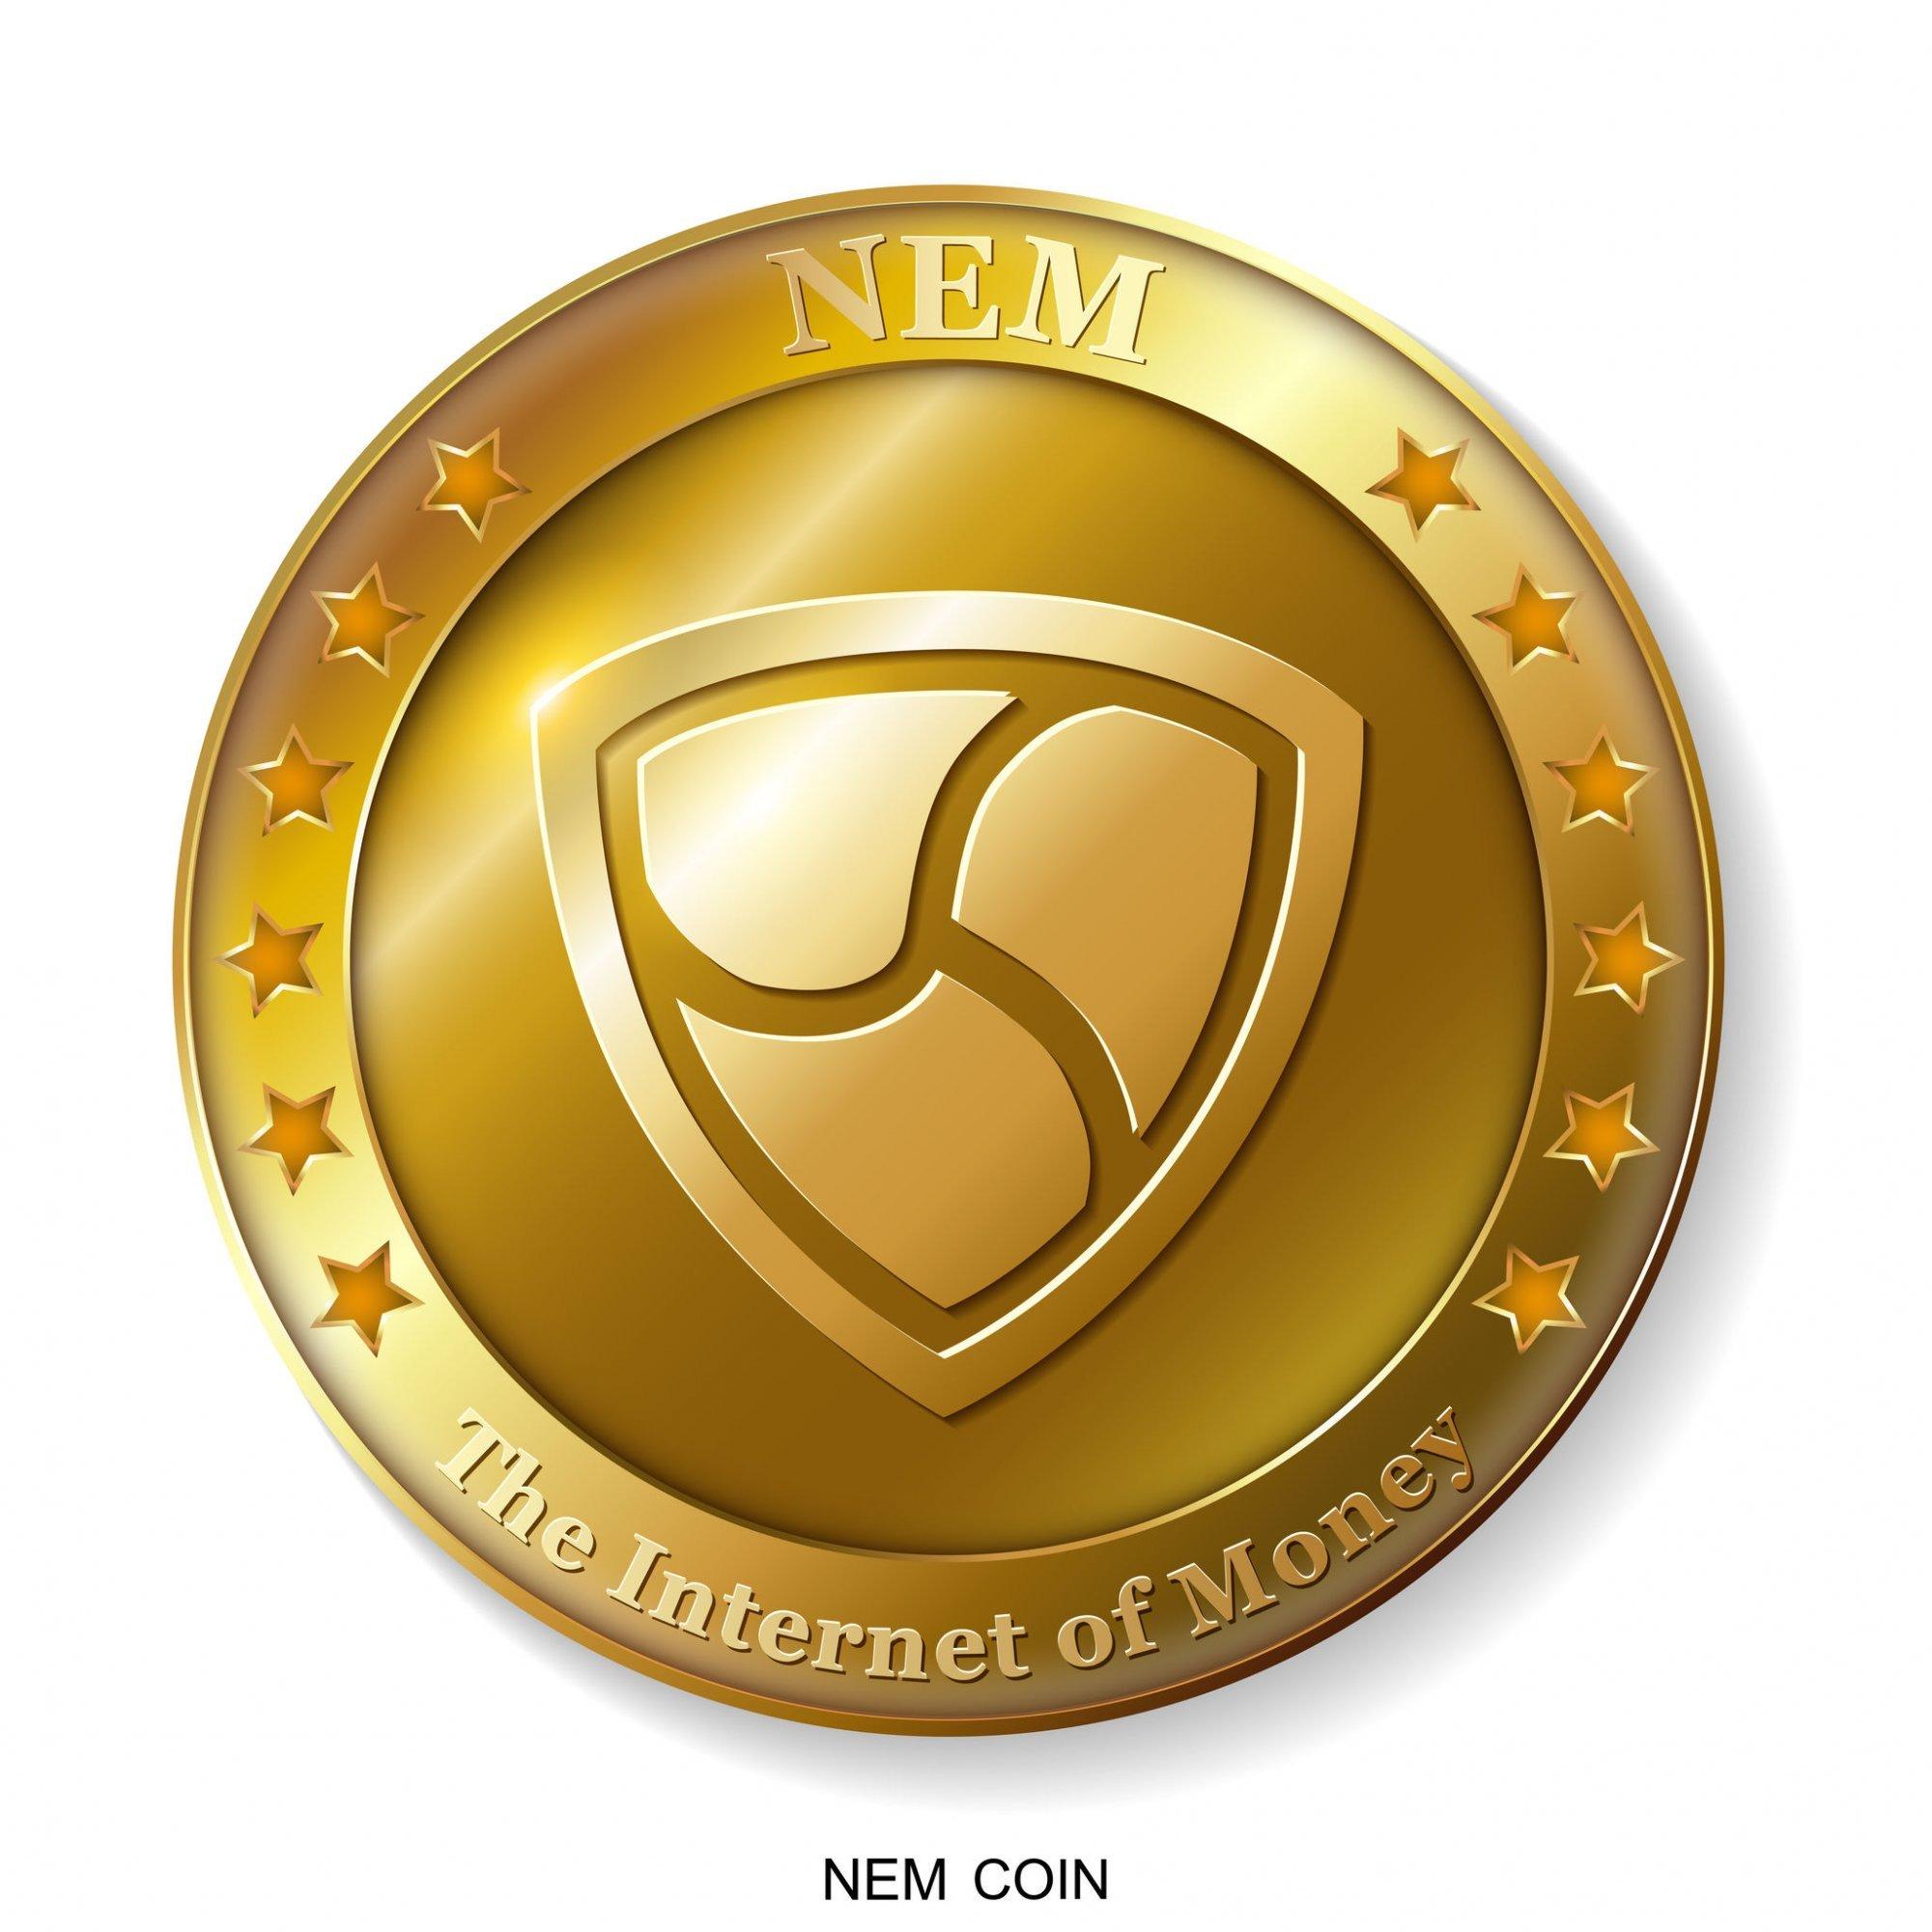 xem coin news today